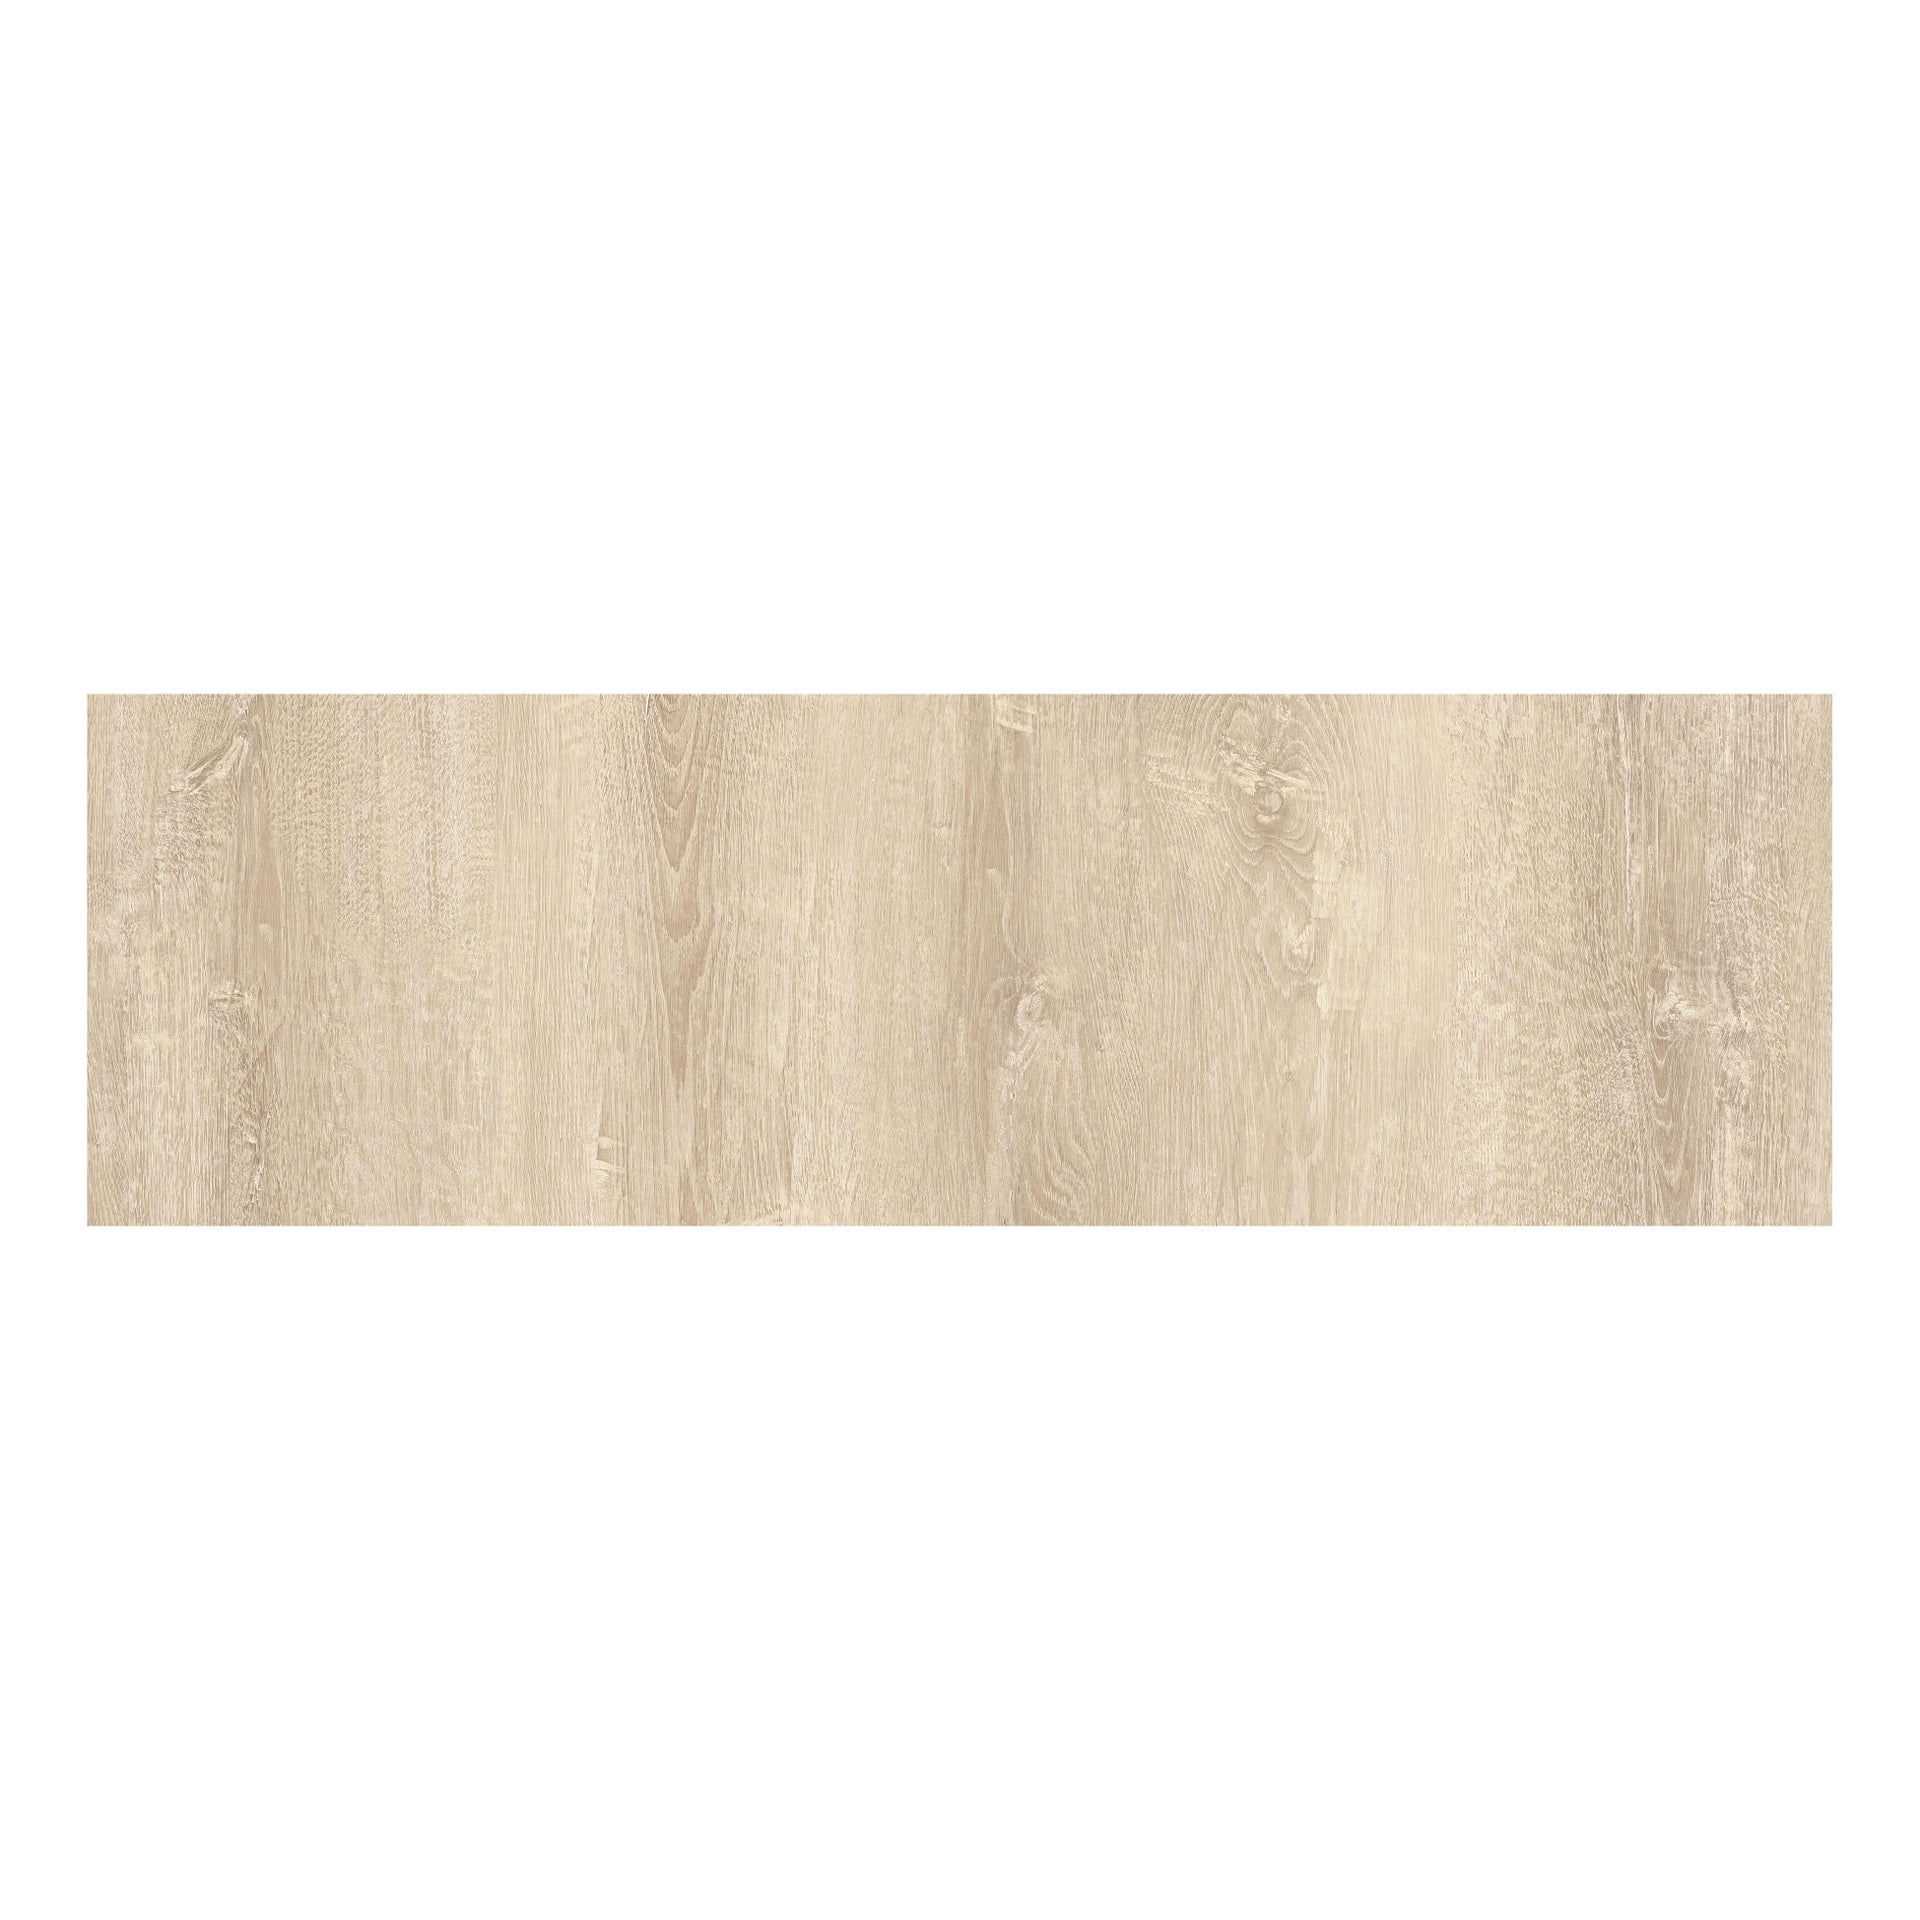 Pavimento PVC adesivo Senso Baladlight Sp 2.5 mm beige - 11